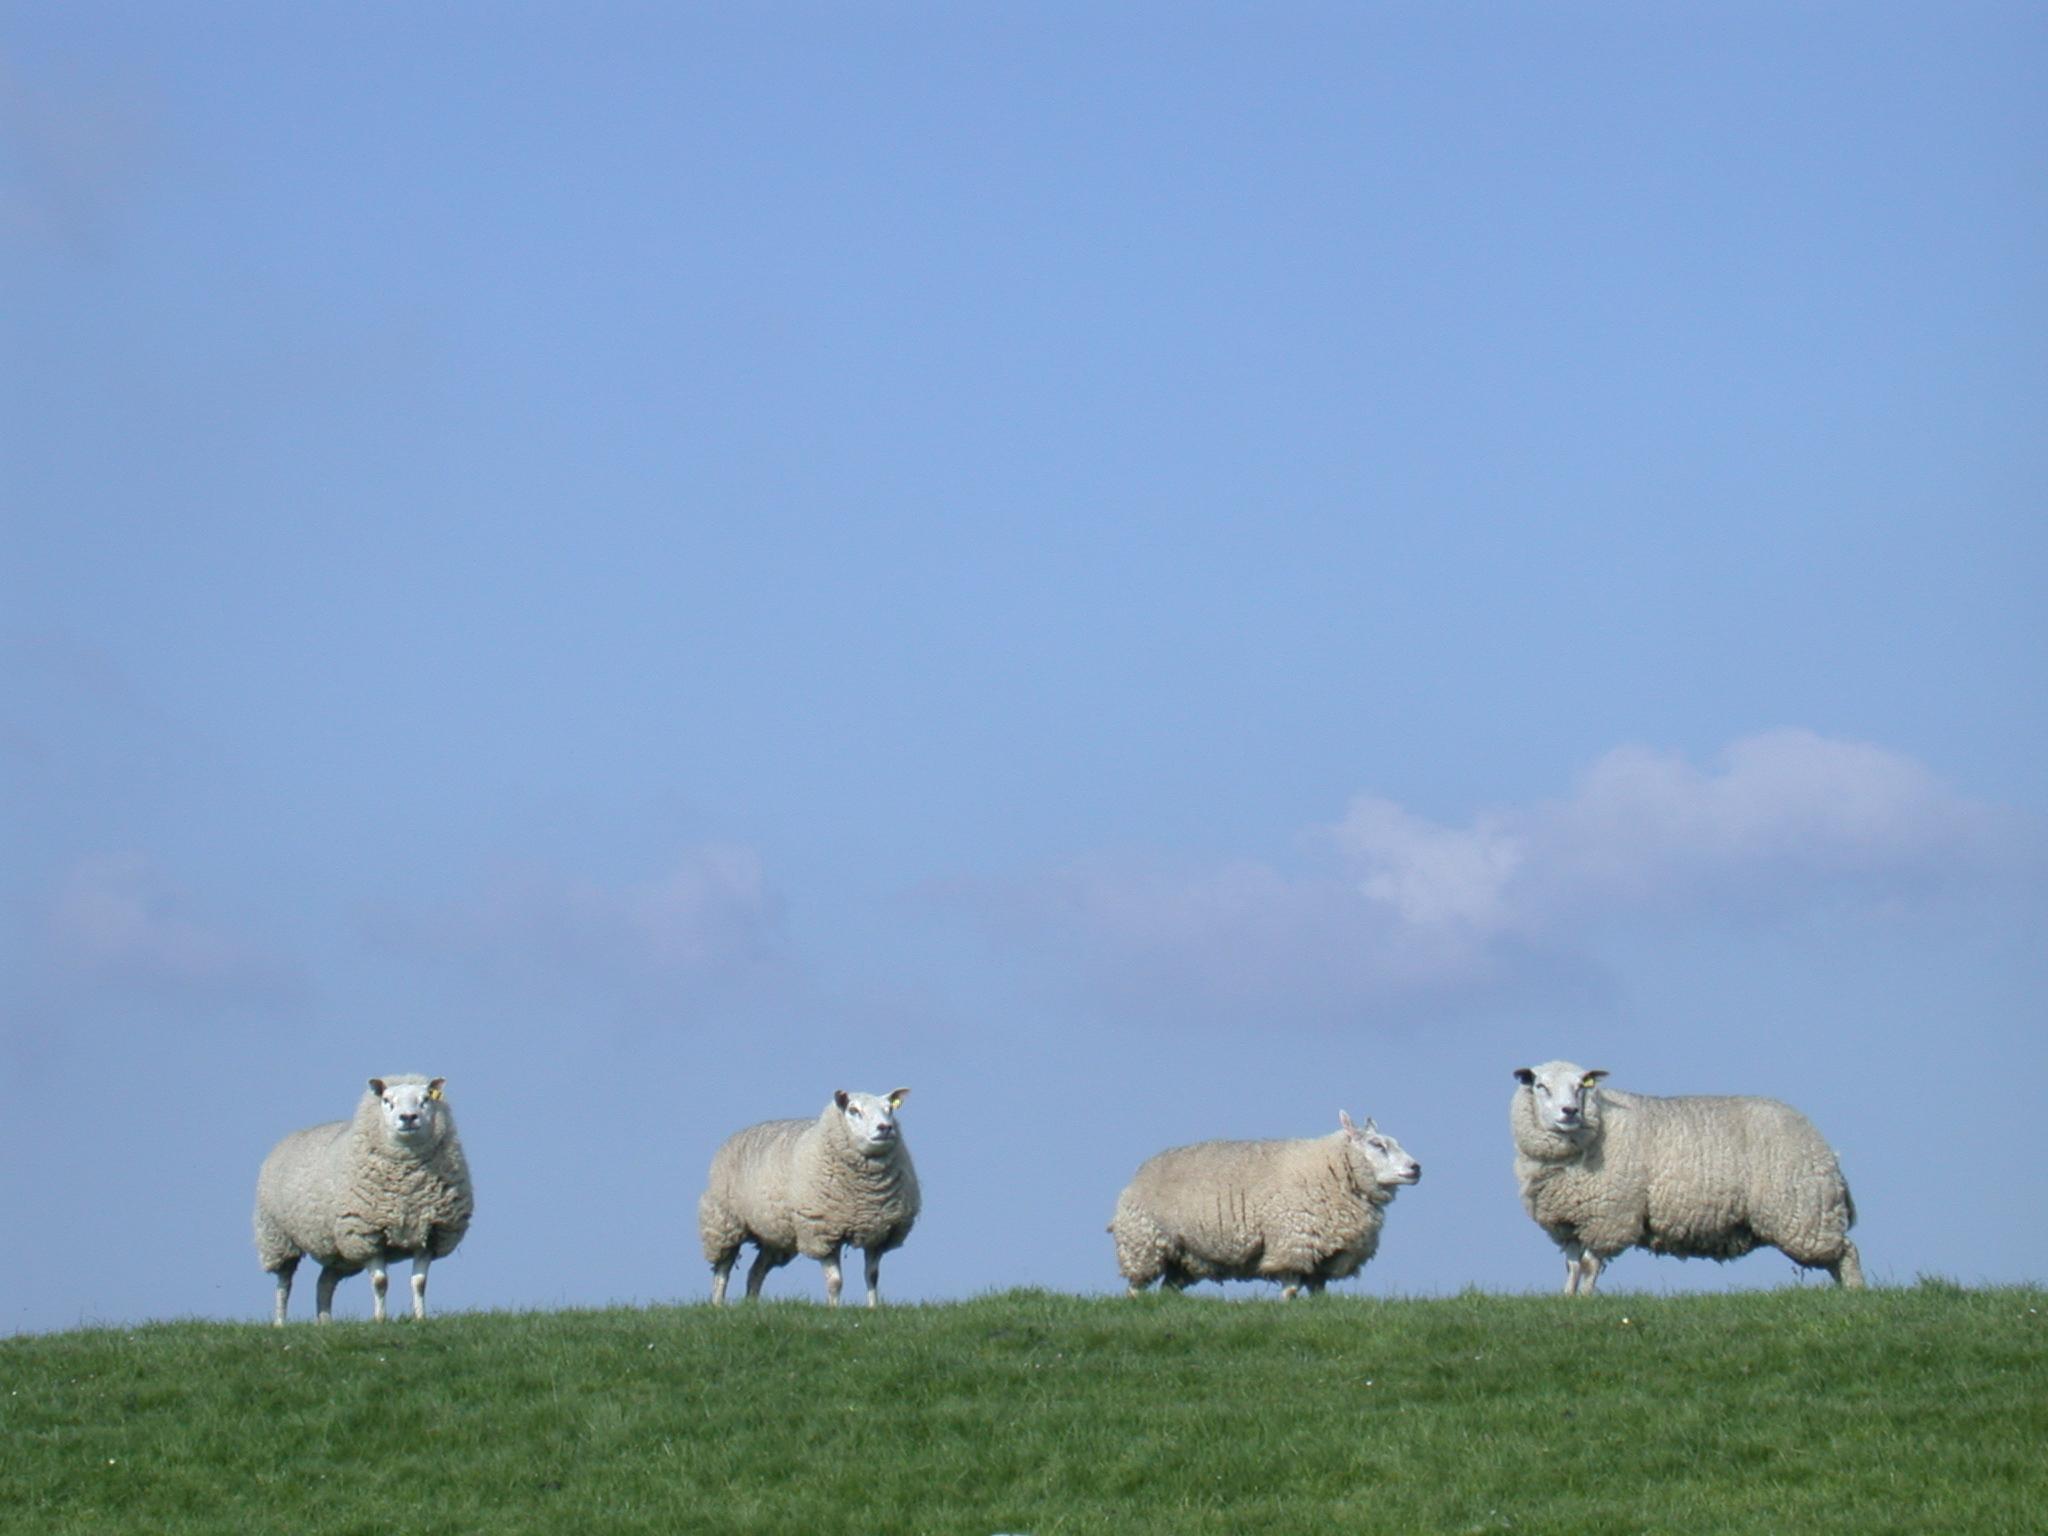 nature animals land sheep standing on dike grass texel